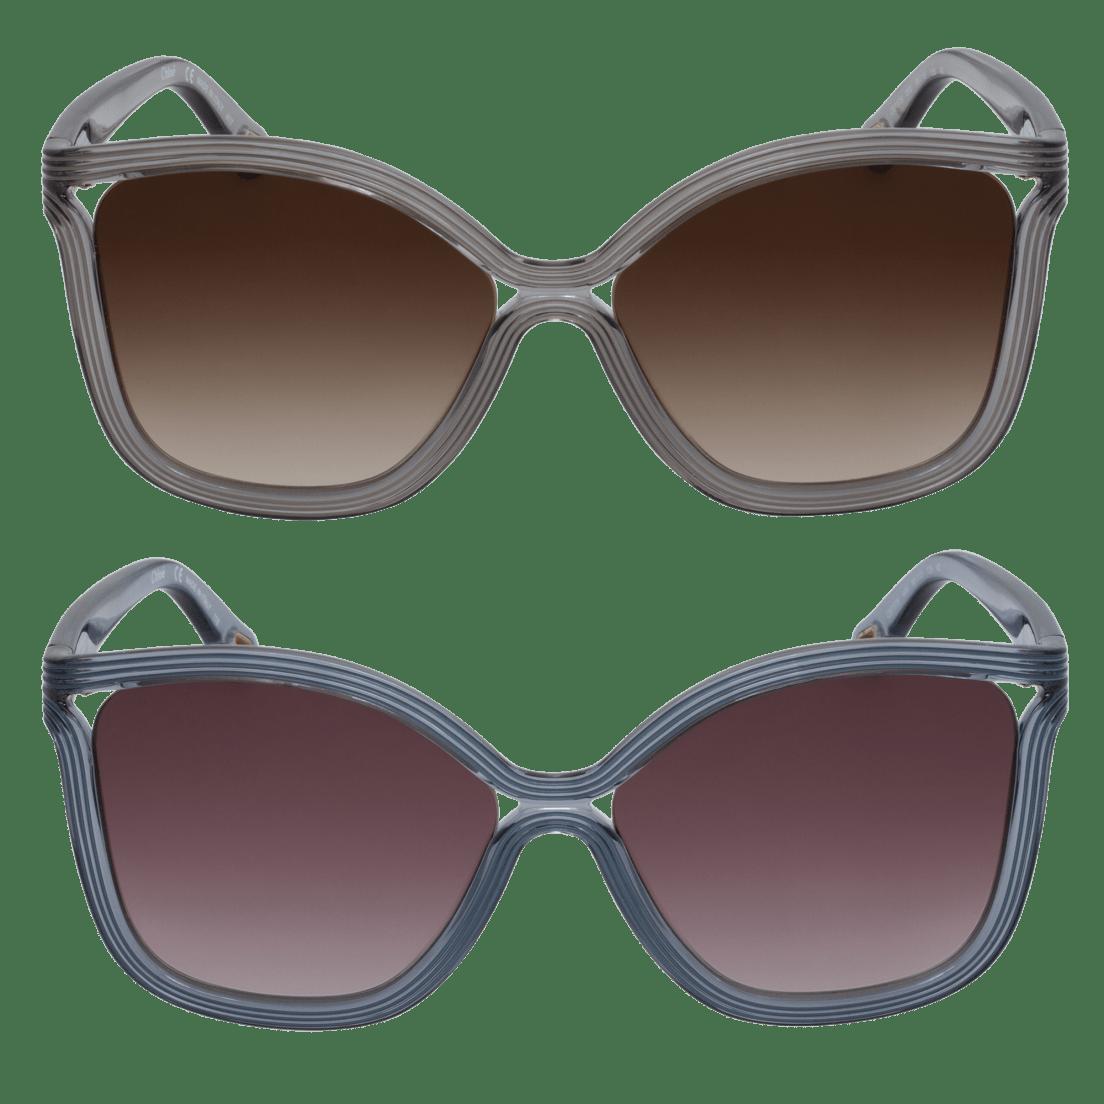 a9dbd526 Chloe Women's Square Sunglasses